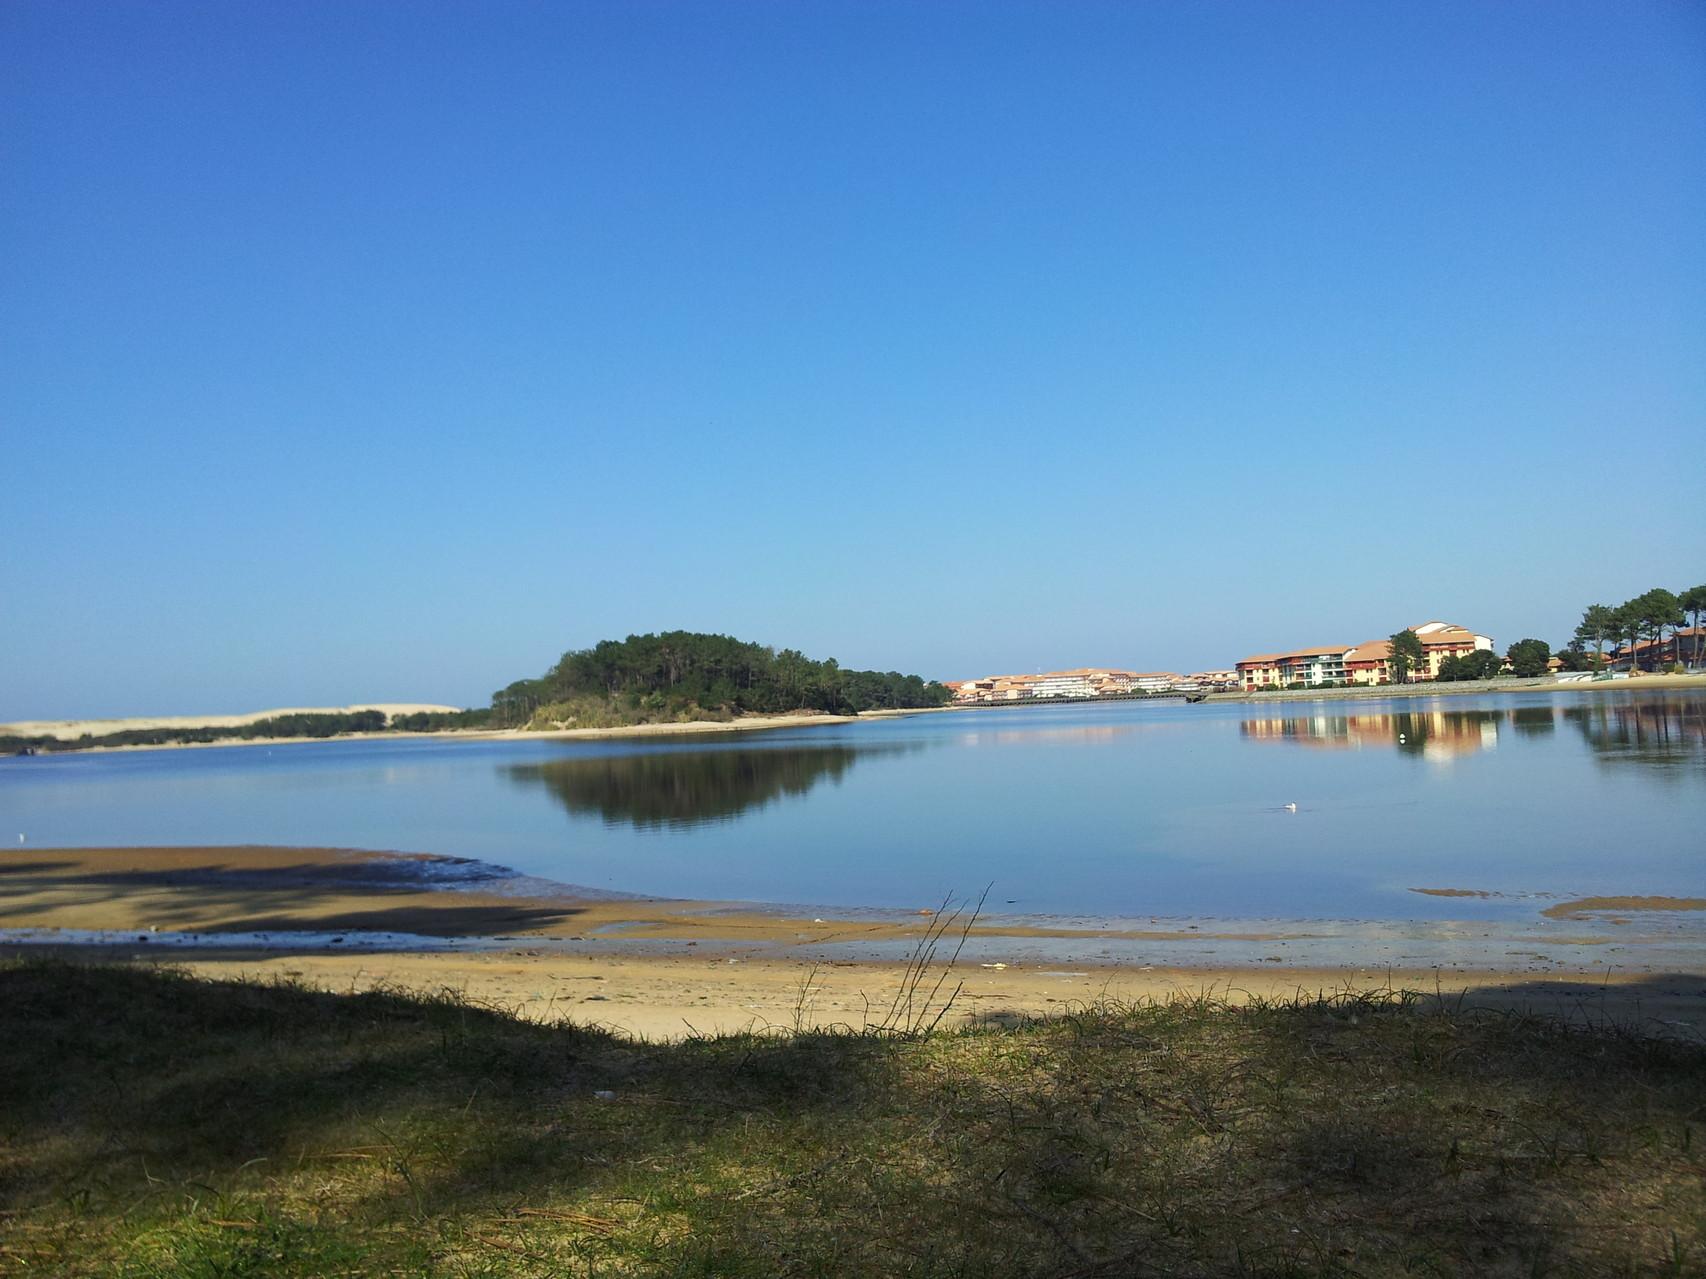 Locations vacances proche : Lac de Port d'Albret à 150m !